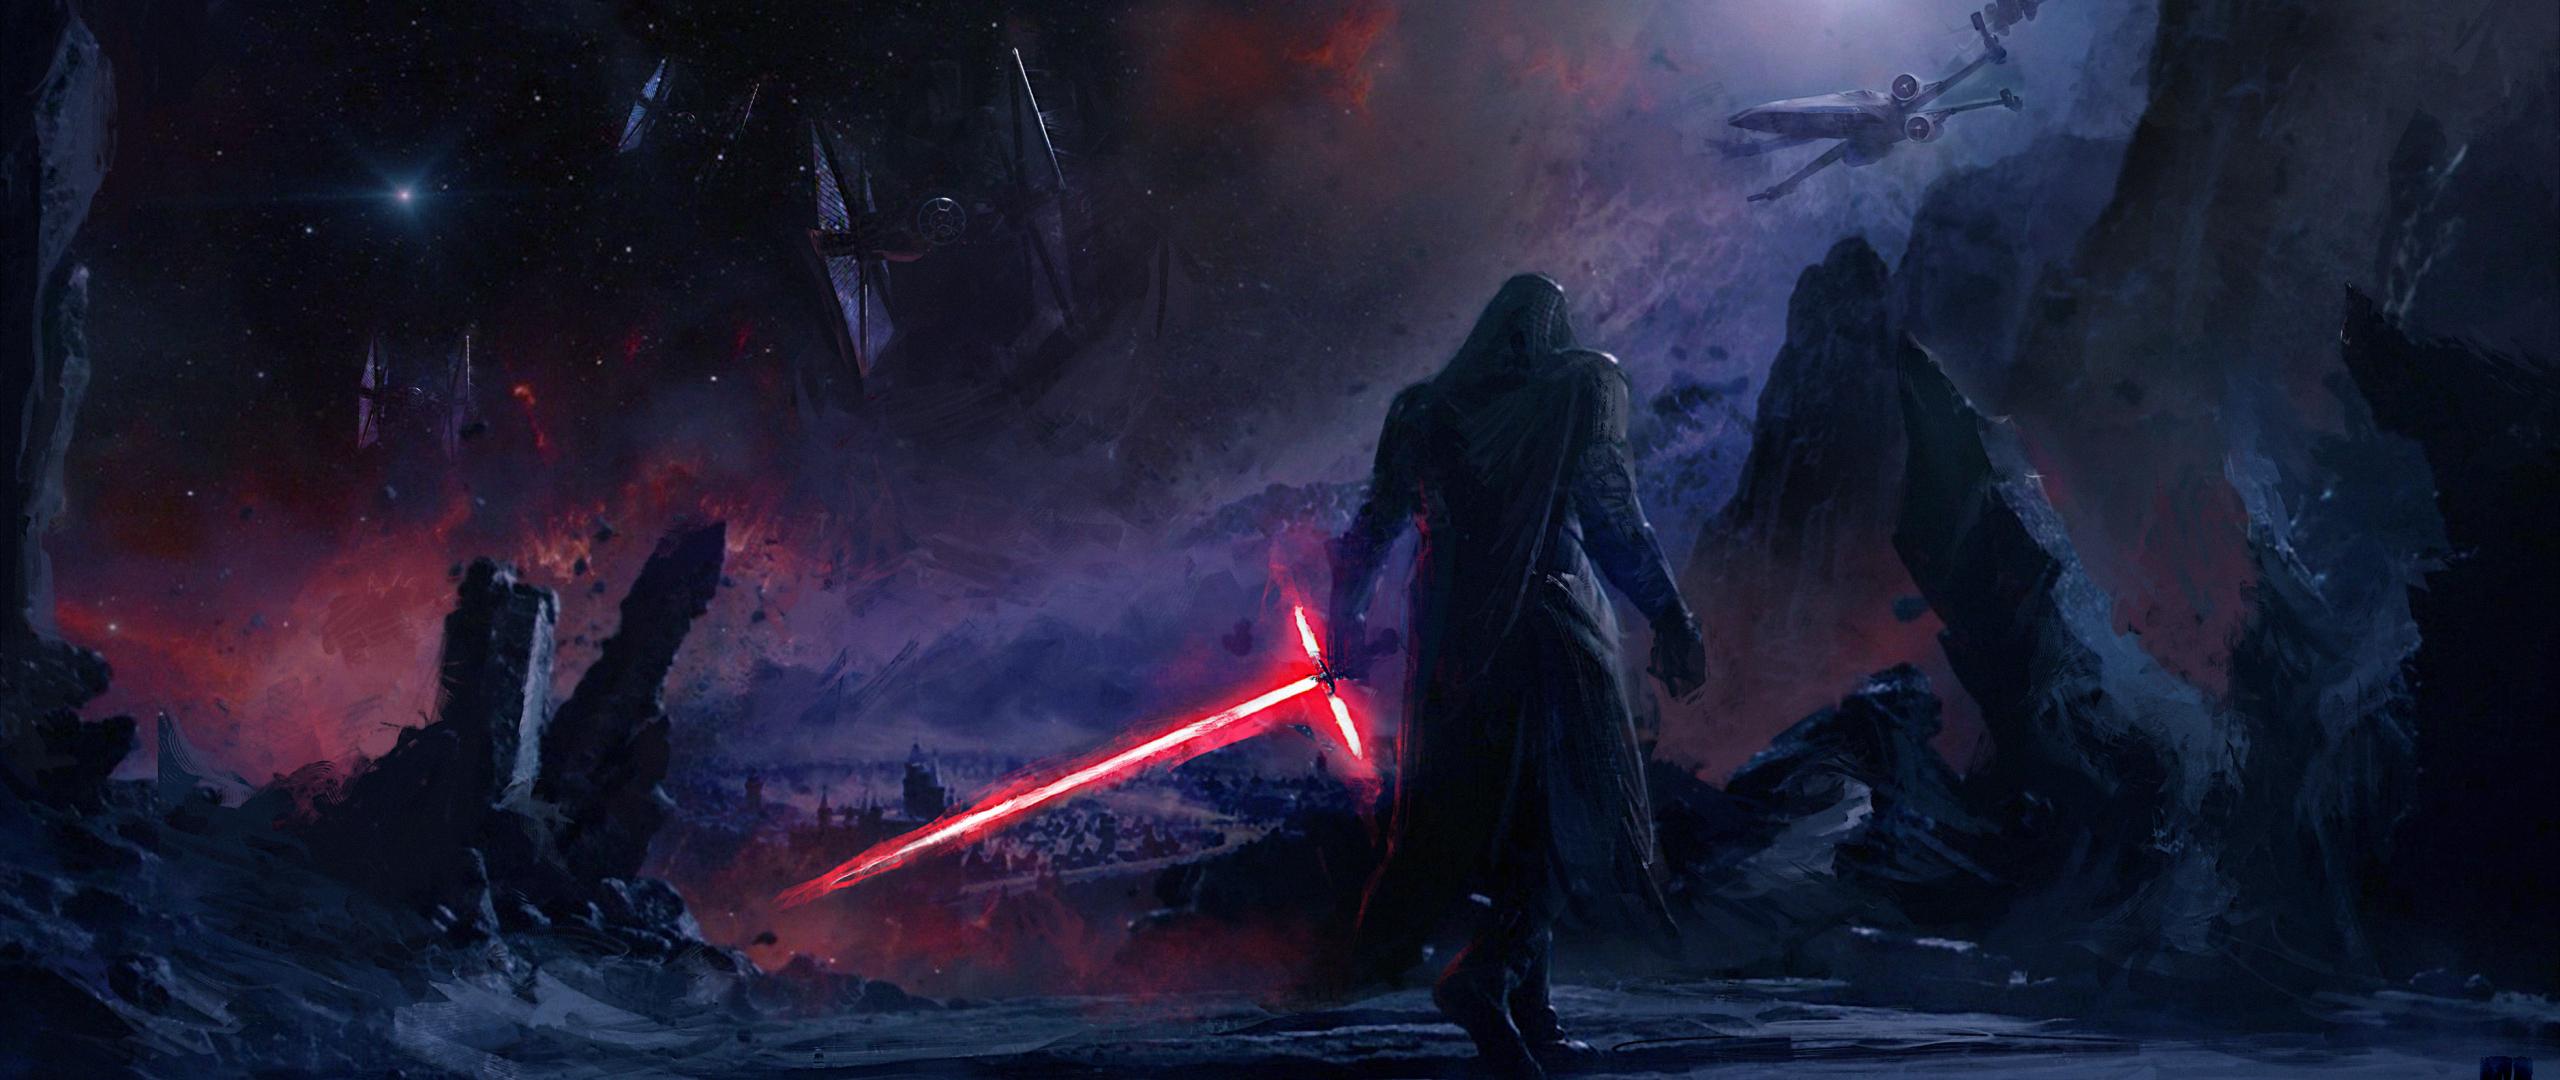 Desktop Wallpaper Kylo Ren Villain Star Wars Artwork 4k Hd Image Picture Background 5eeb9f